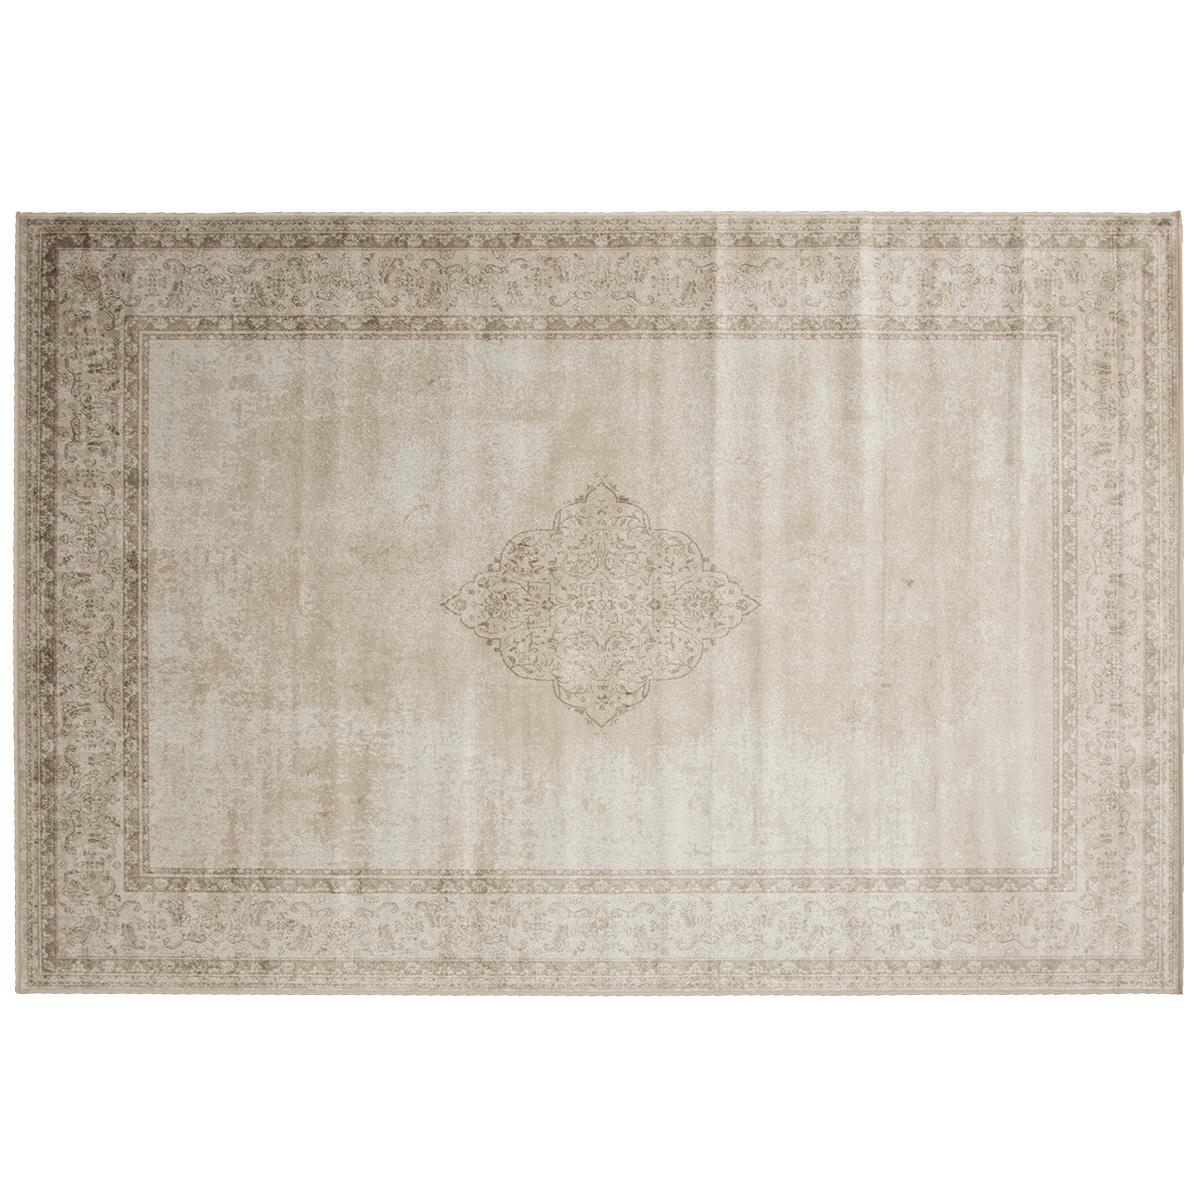 Vloerkleed Brinker Eclipss Sand | 185 x 275 cm